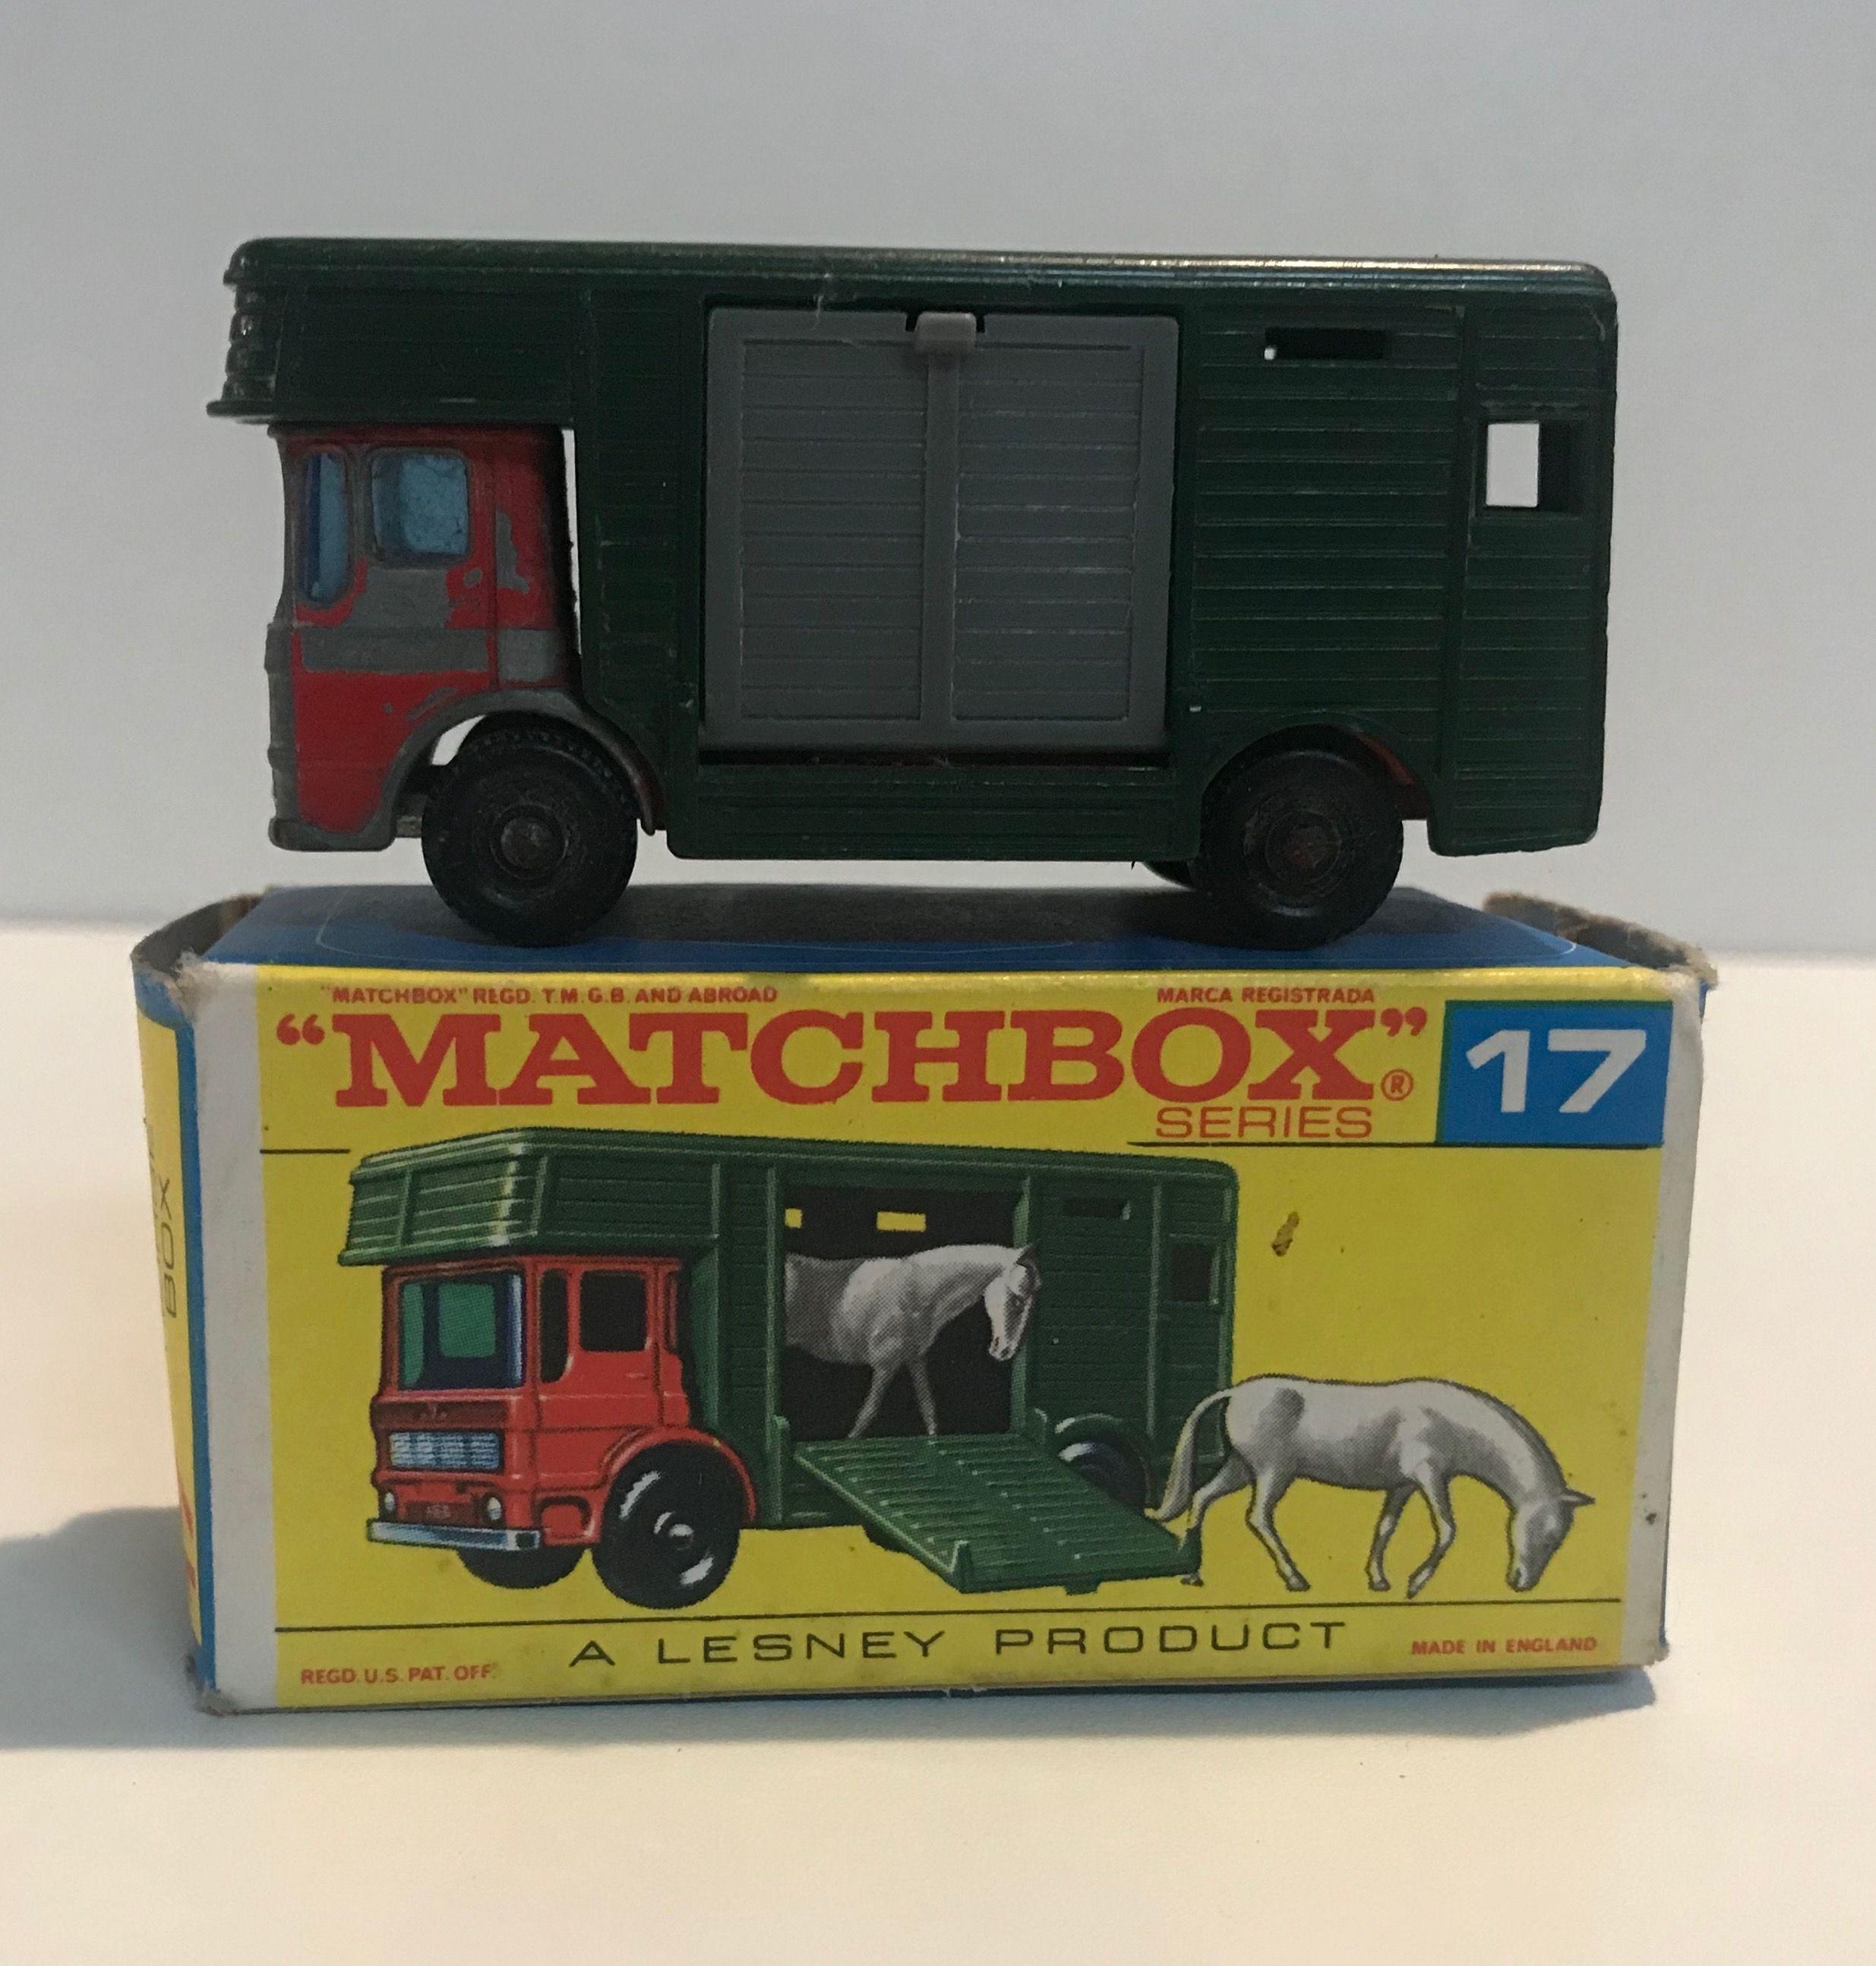 B toys car wheel  Pin by Didieralain Giuria on Matchbox  Pinterest  Matchbox cars